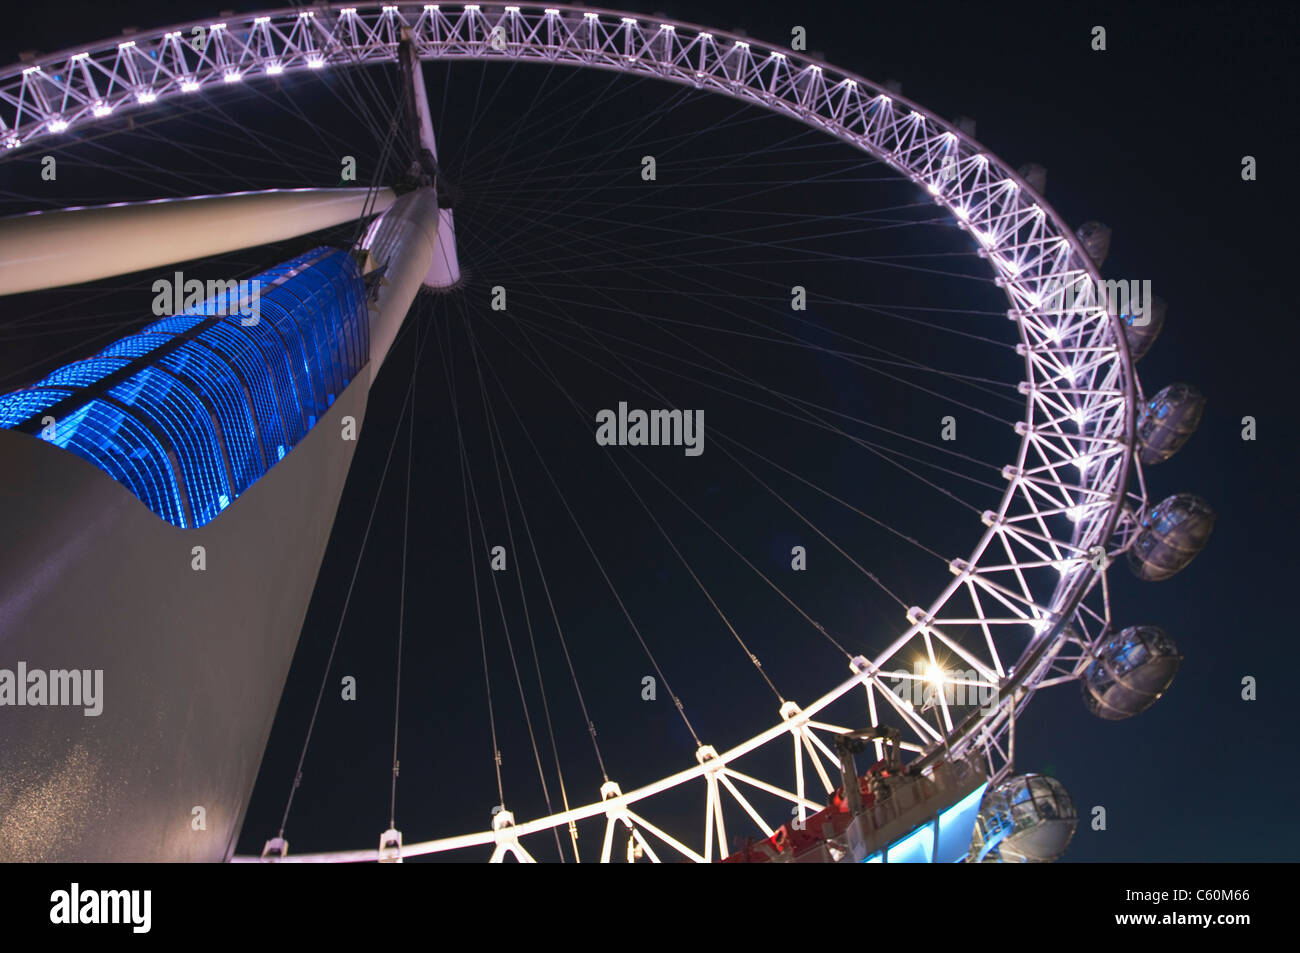 London Eye ferris wheel - Stock Image